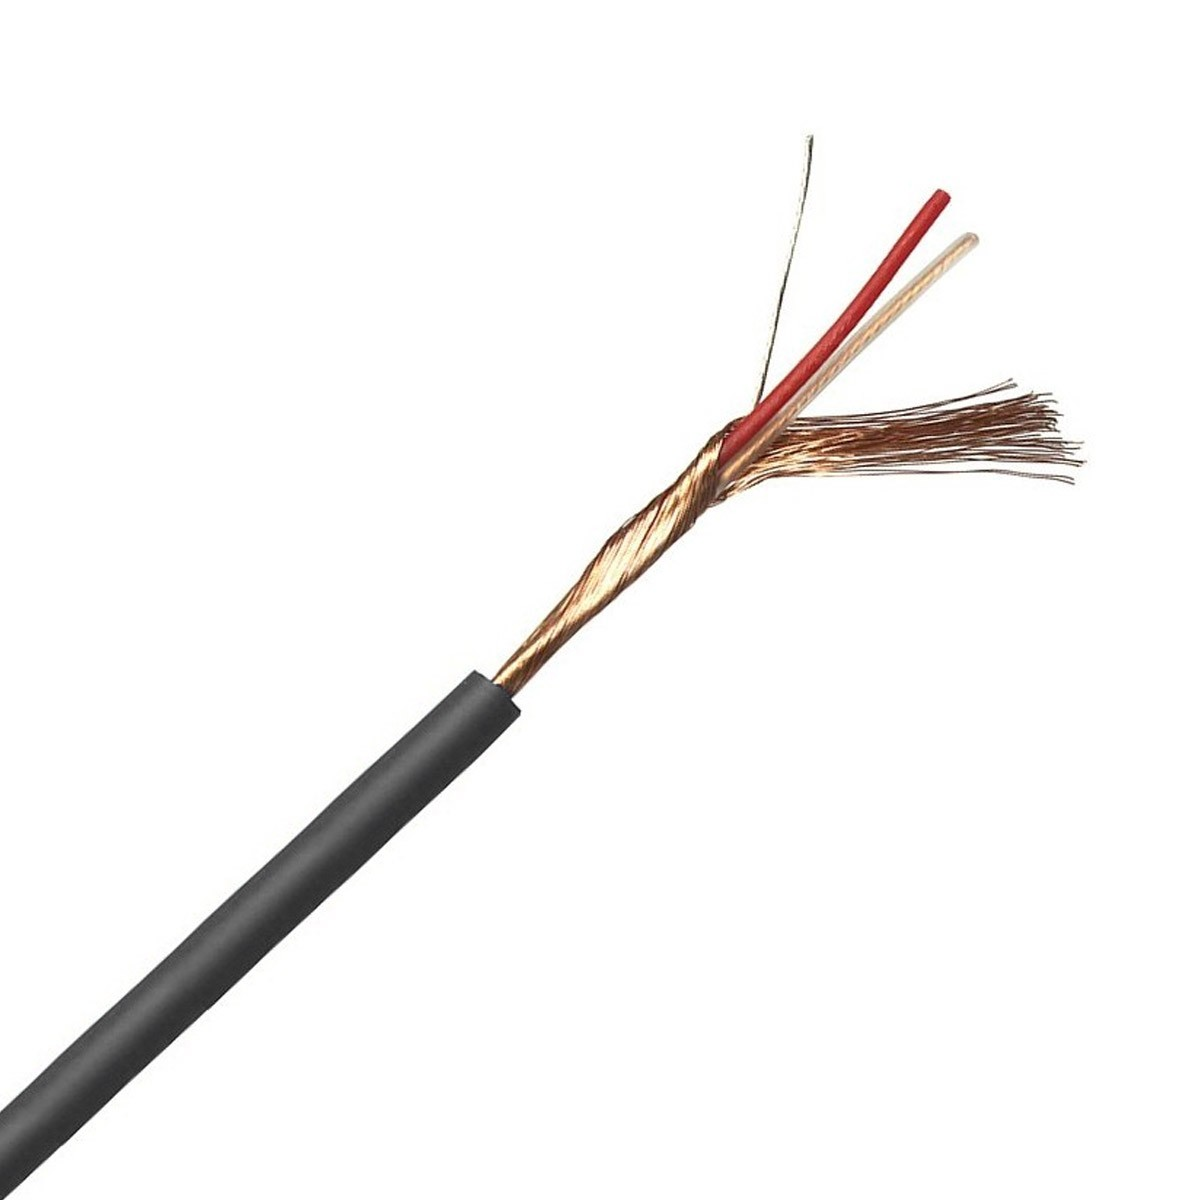 MOGAMI 3080 AES / EBU Digital cable 110 Ohm 2x0.18mm² Ø5mm